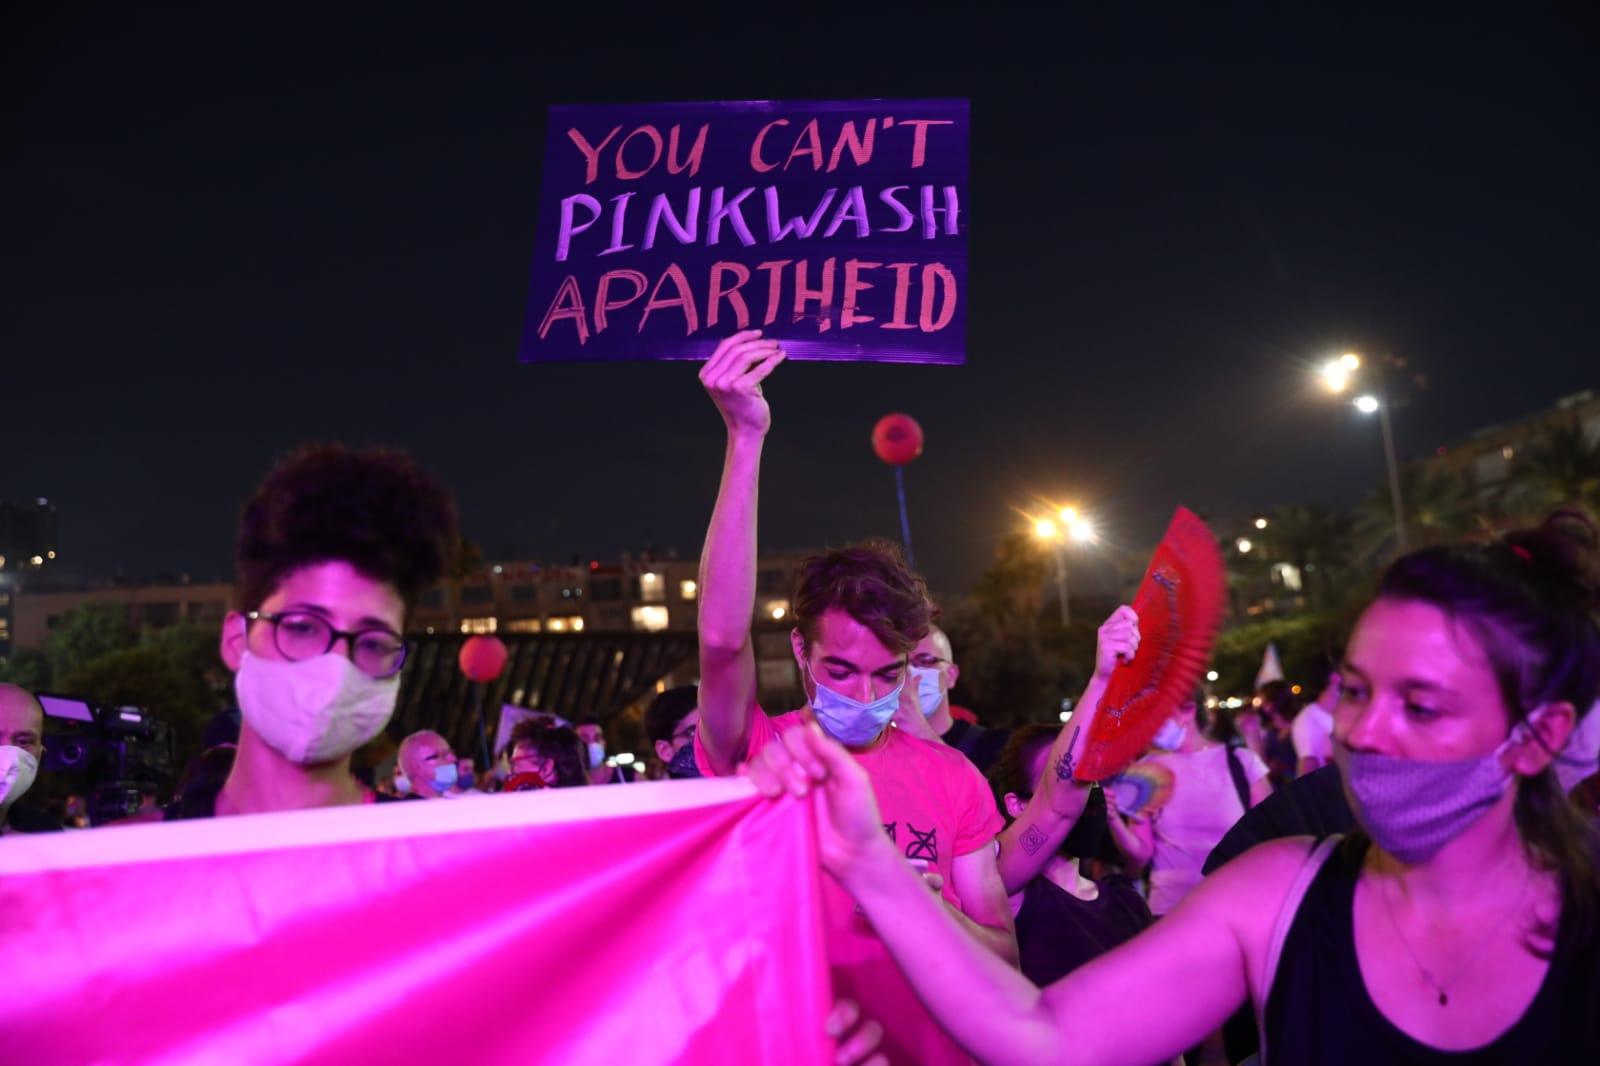 Left-wing activists protest pinkwashing at Tel Aviv Pride, June 28, 2020. (Oren Ziv/Activestills)